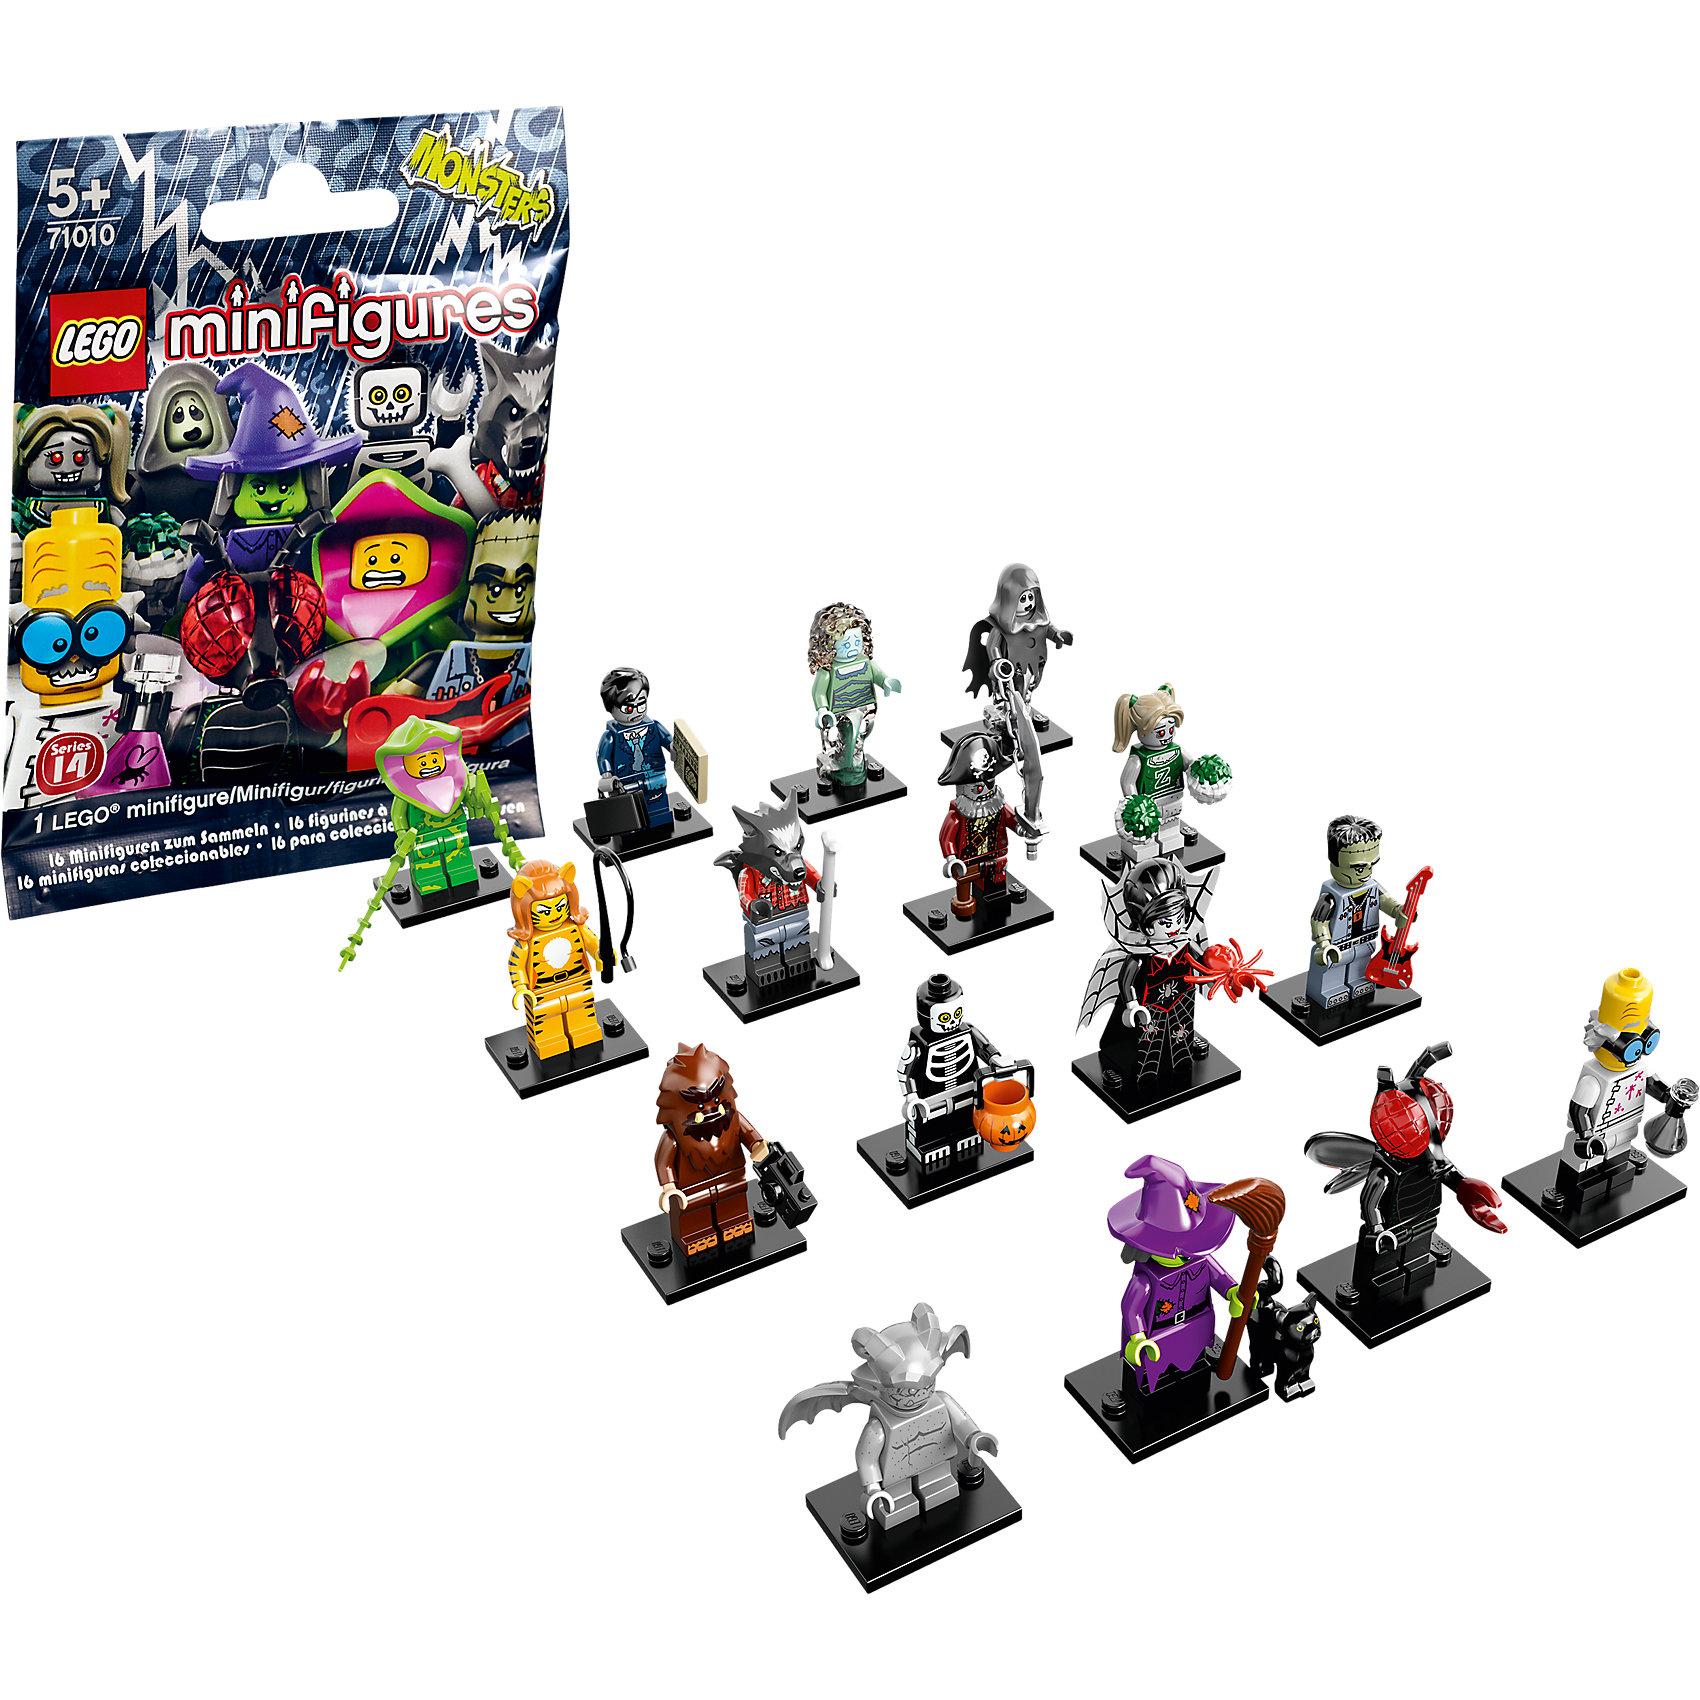 LEGO 71010: Минифигурки